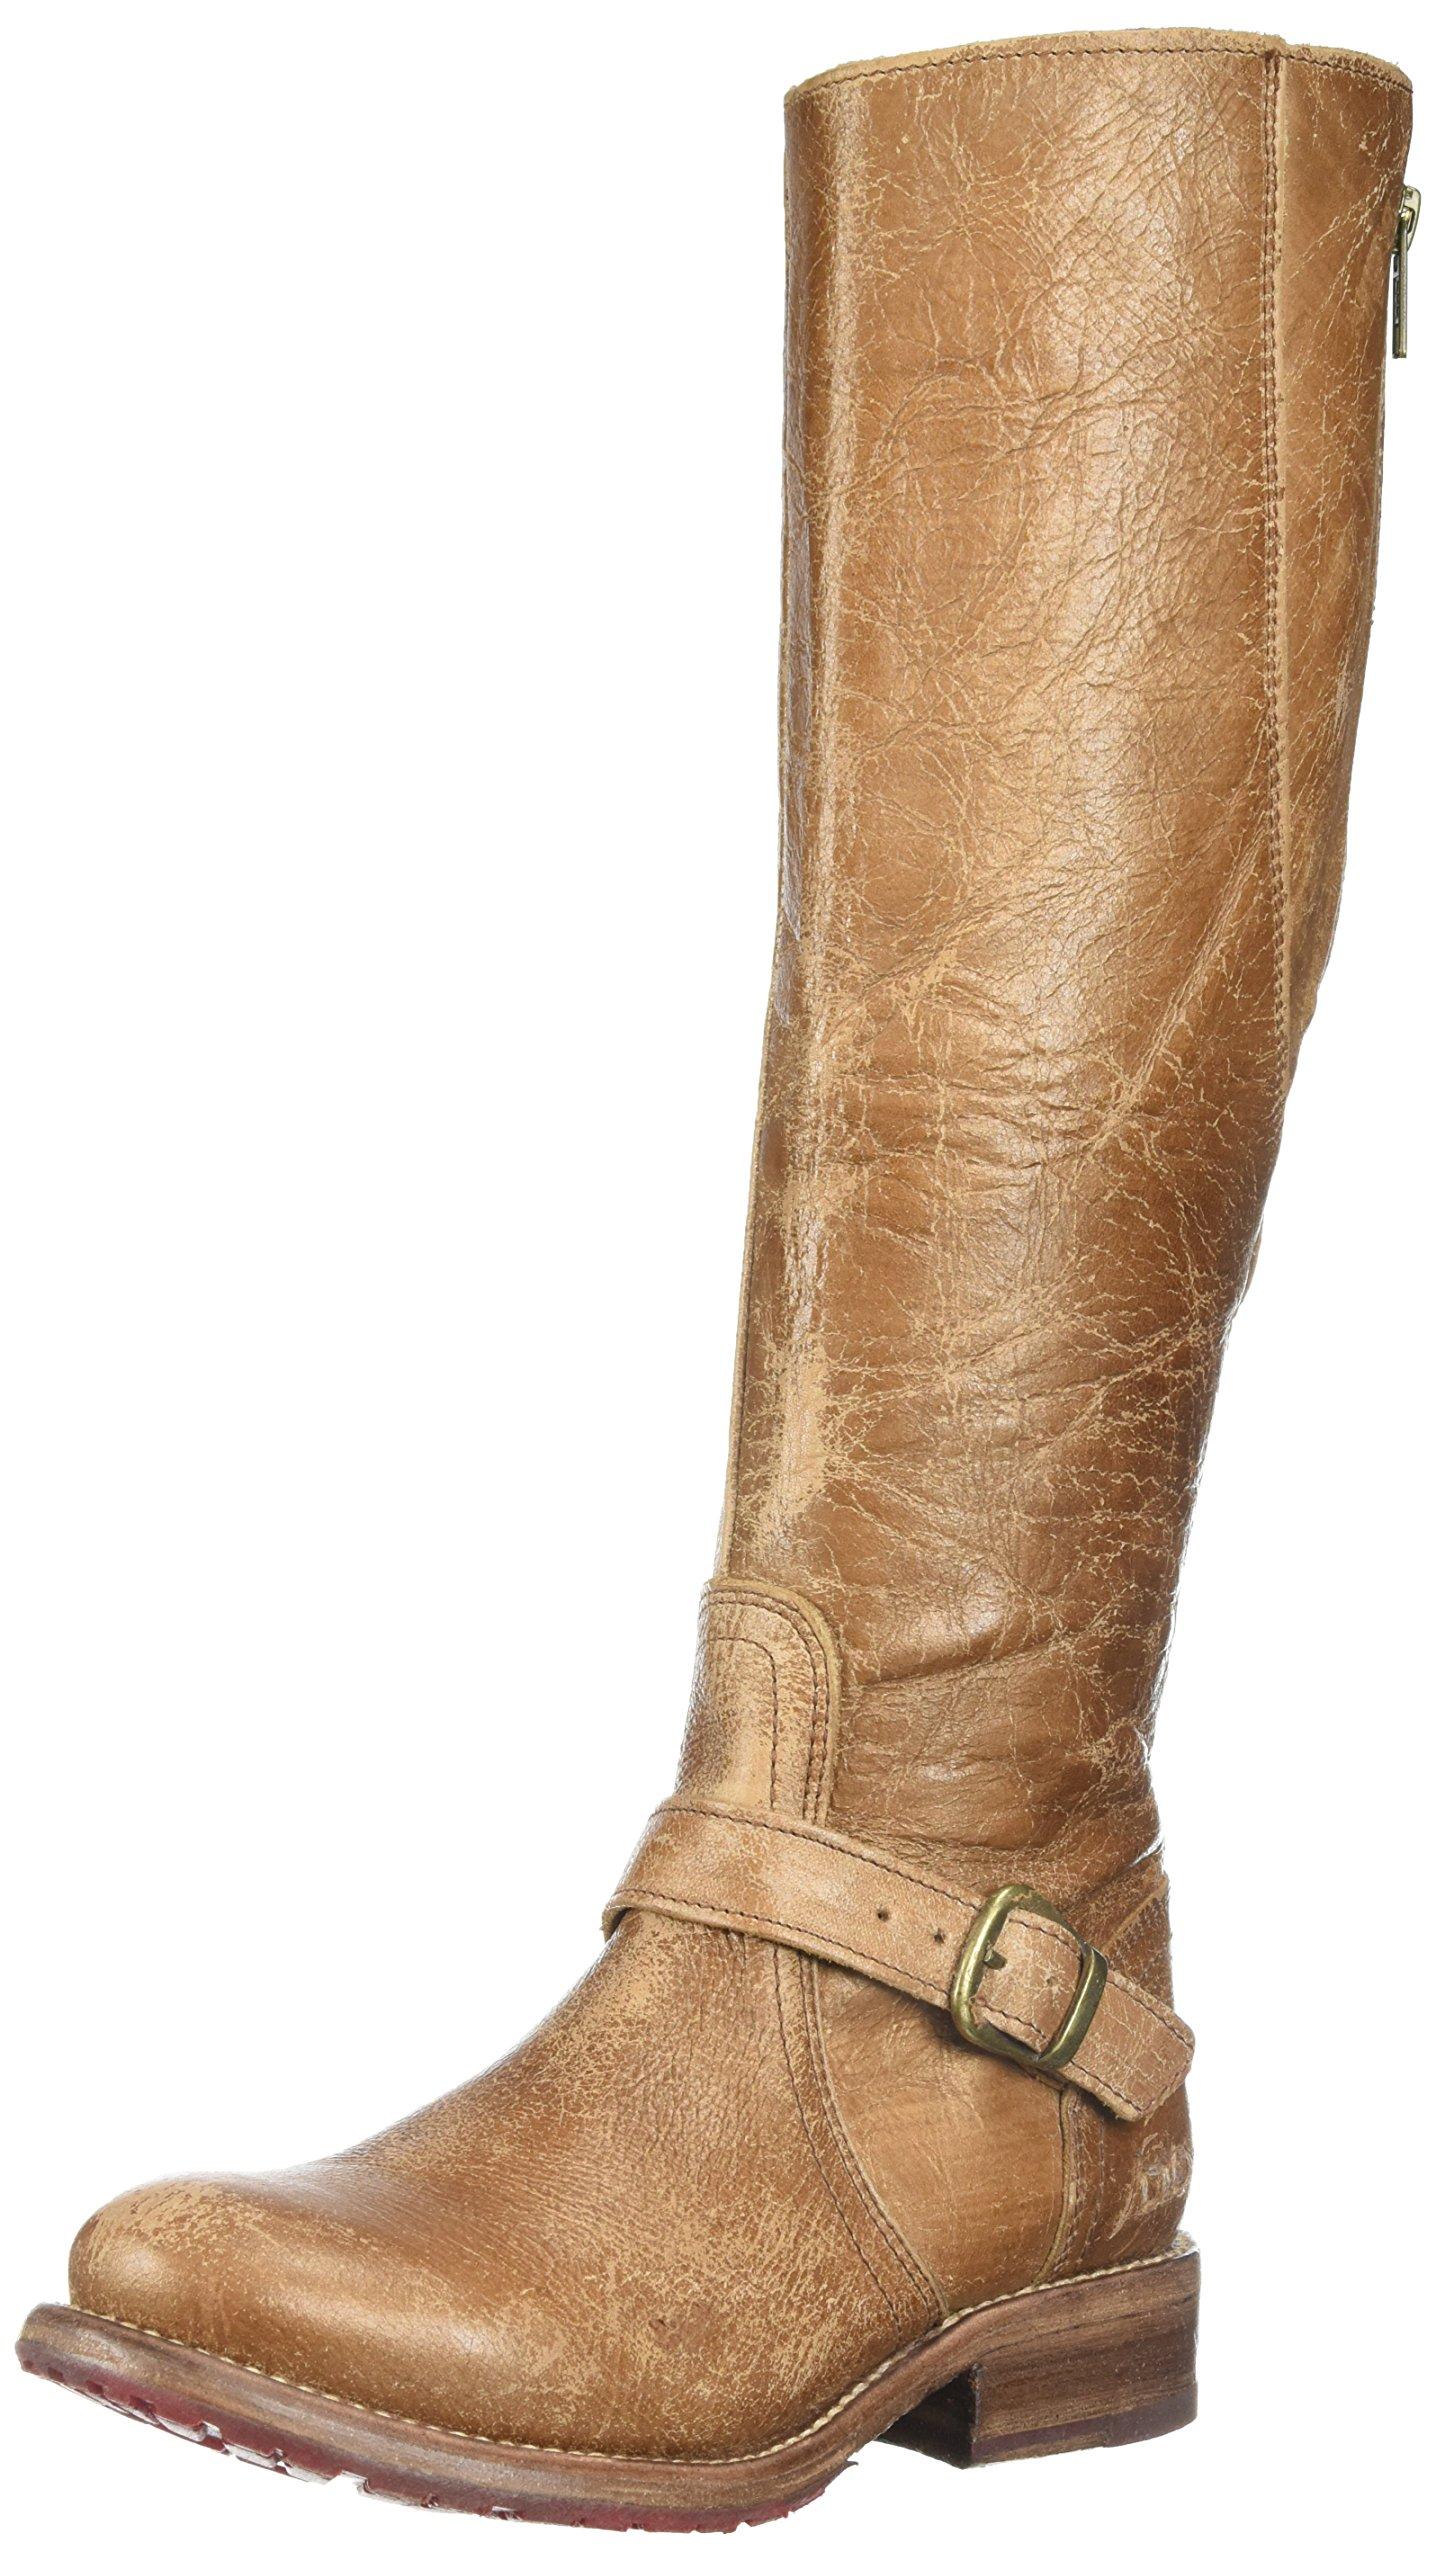 Bed Stu Women's Glaye Fashion Boot, Caramal Lux, 9 Medium US